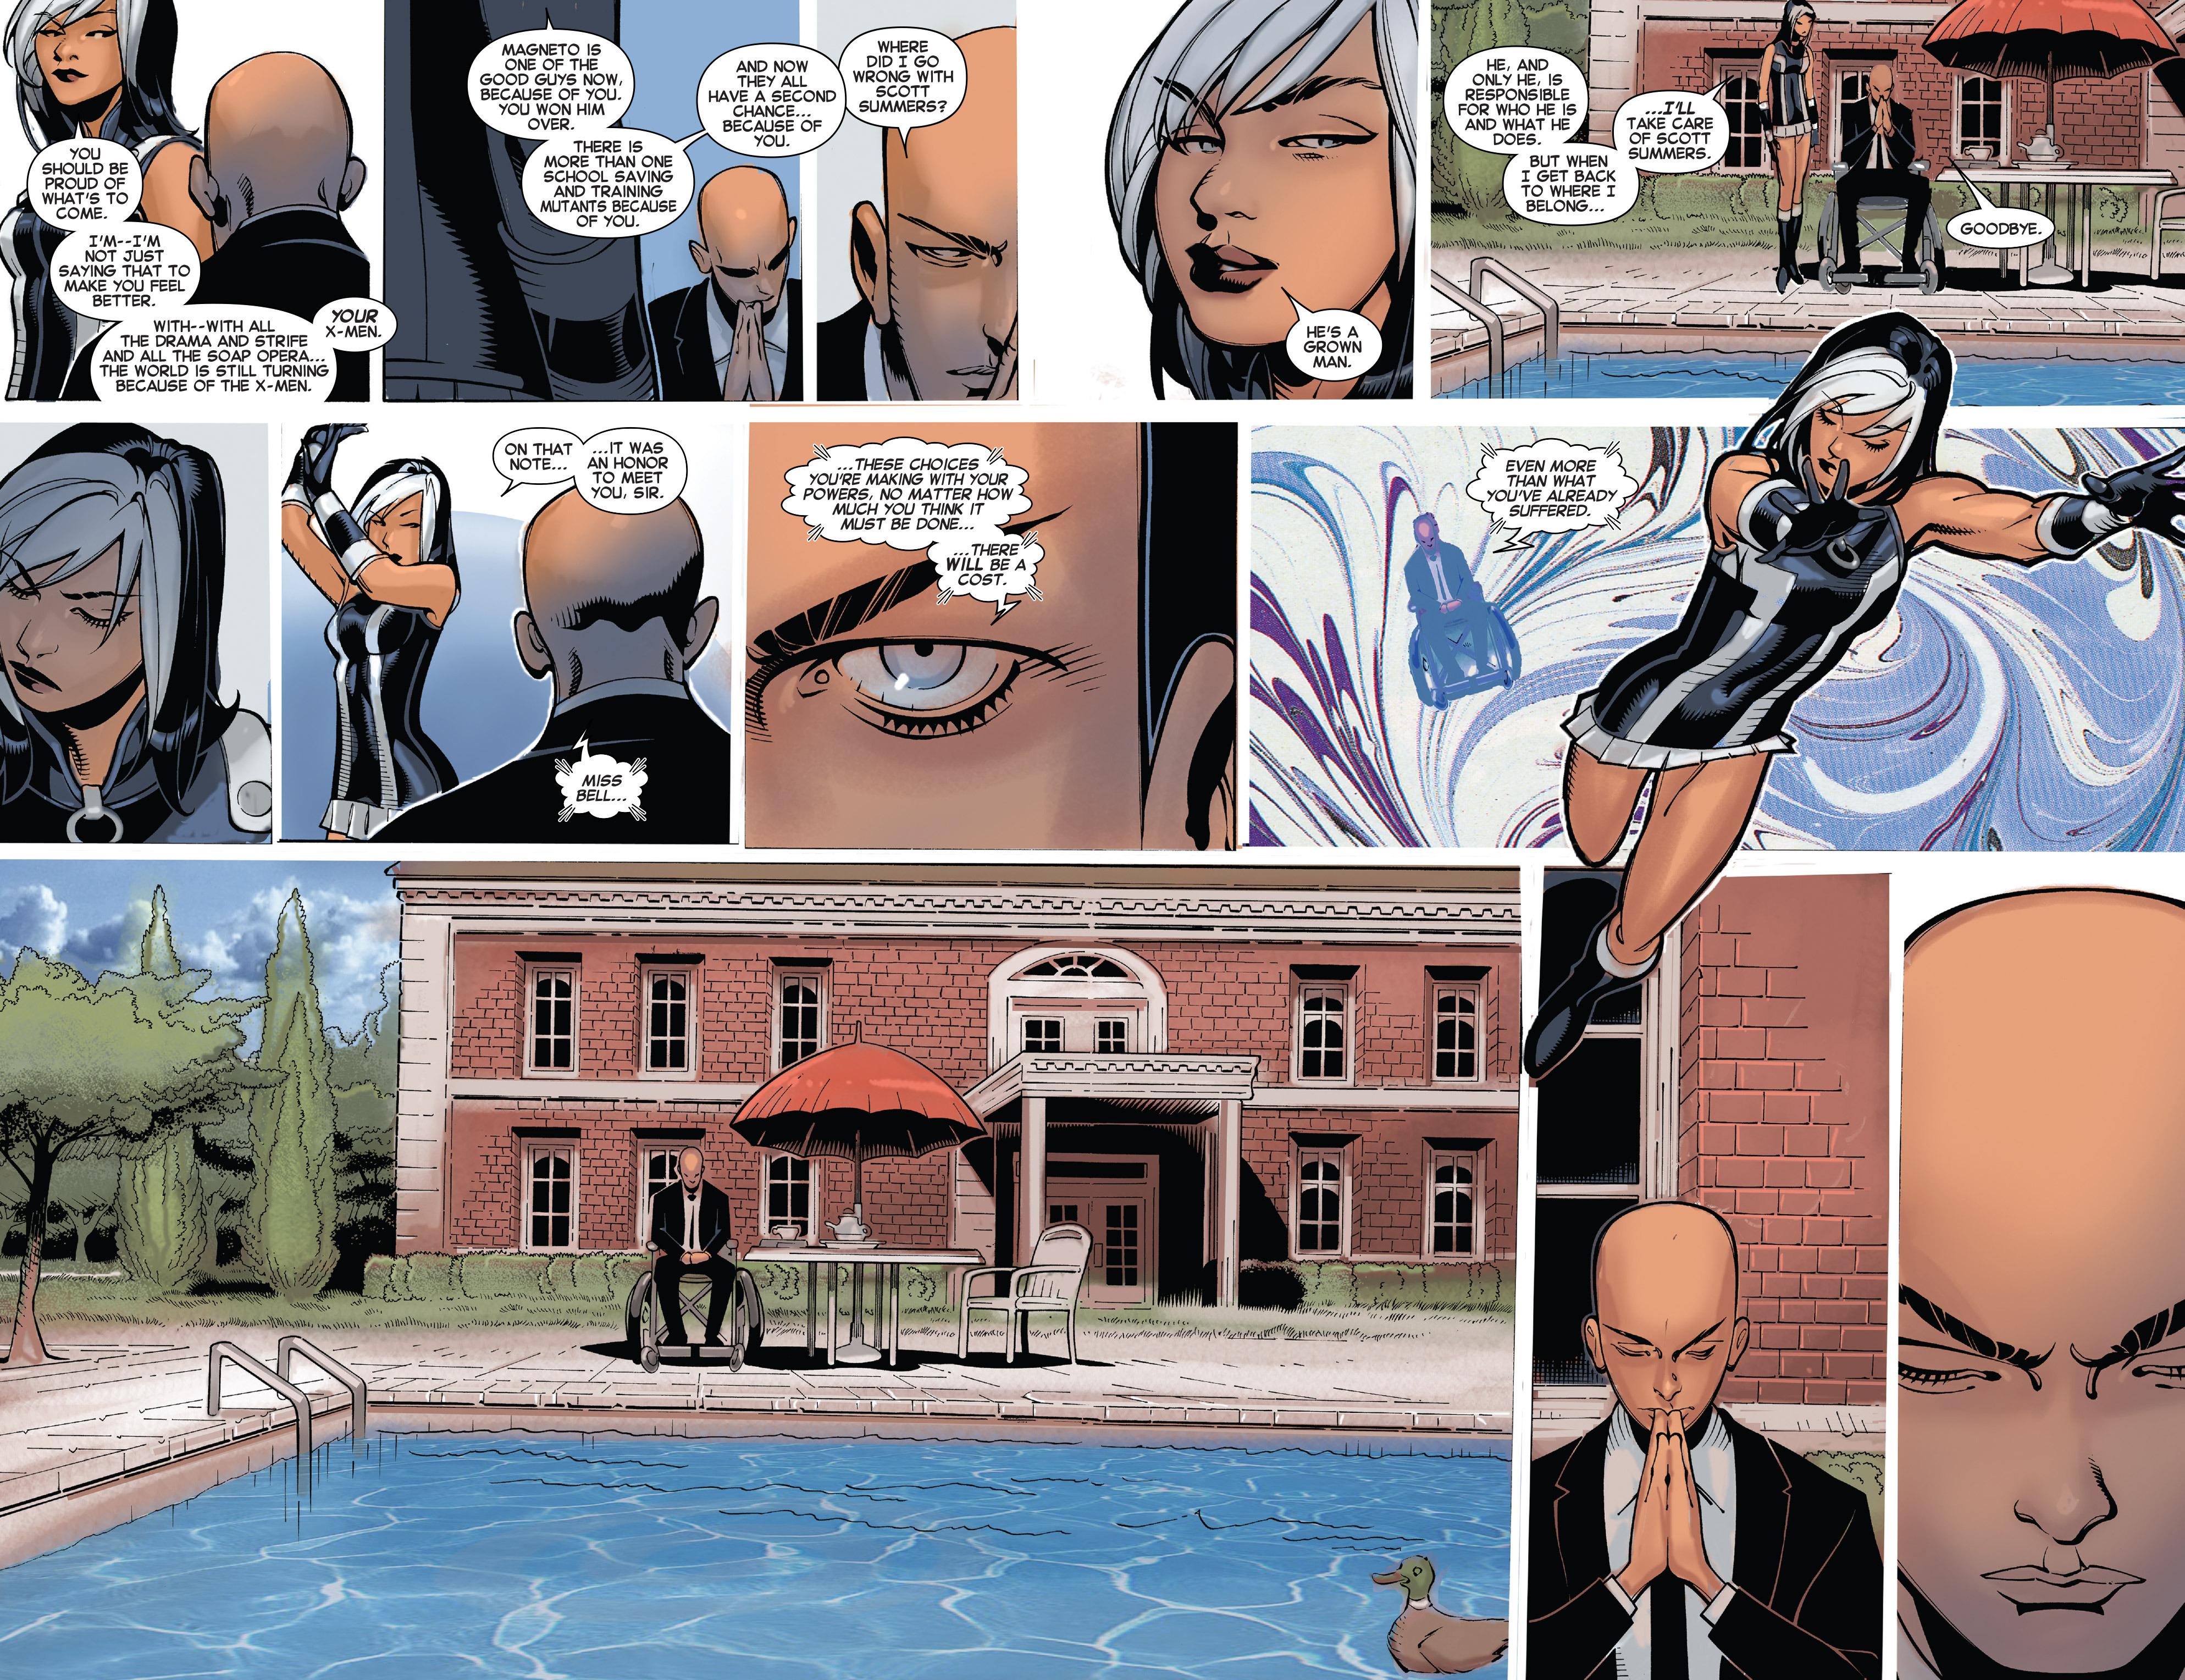 Read online Uncanny X-Men (2013) comic -  Issue # _TPB 5 - The Omega Mutant - 106